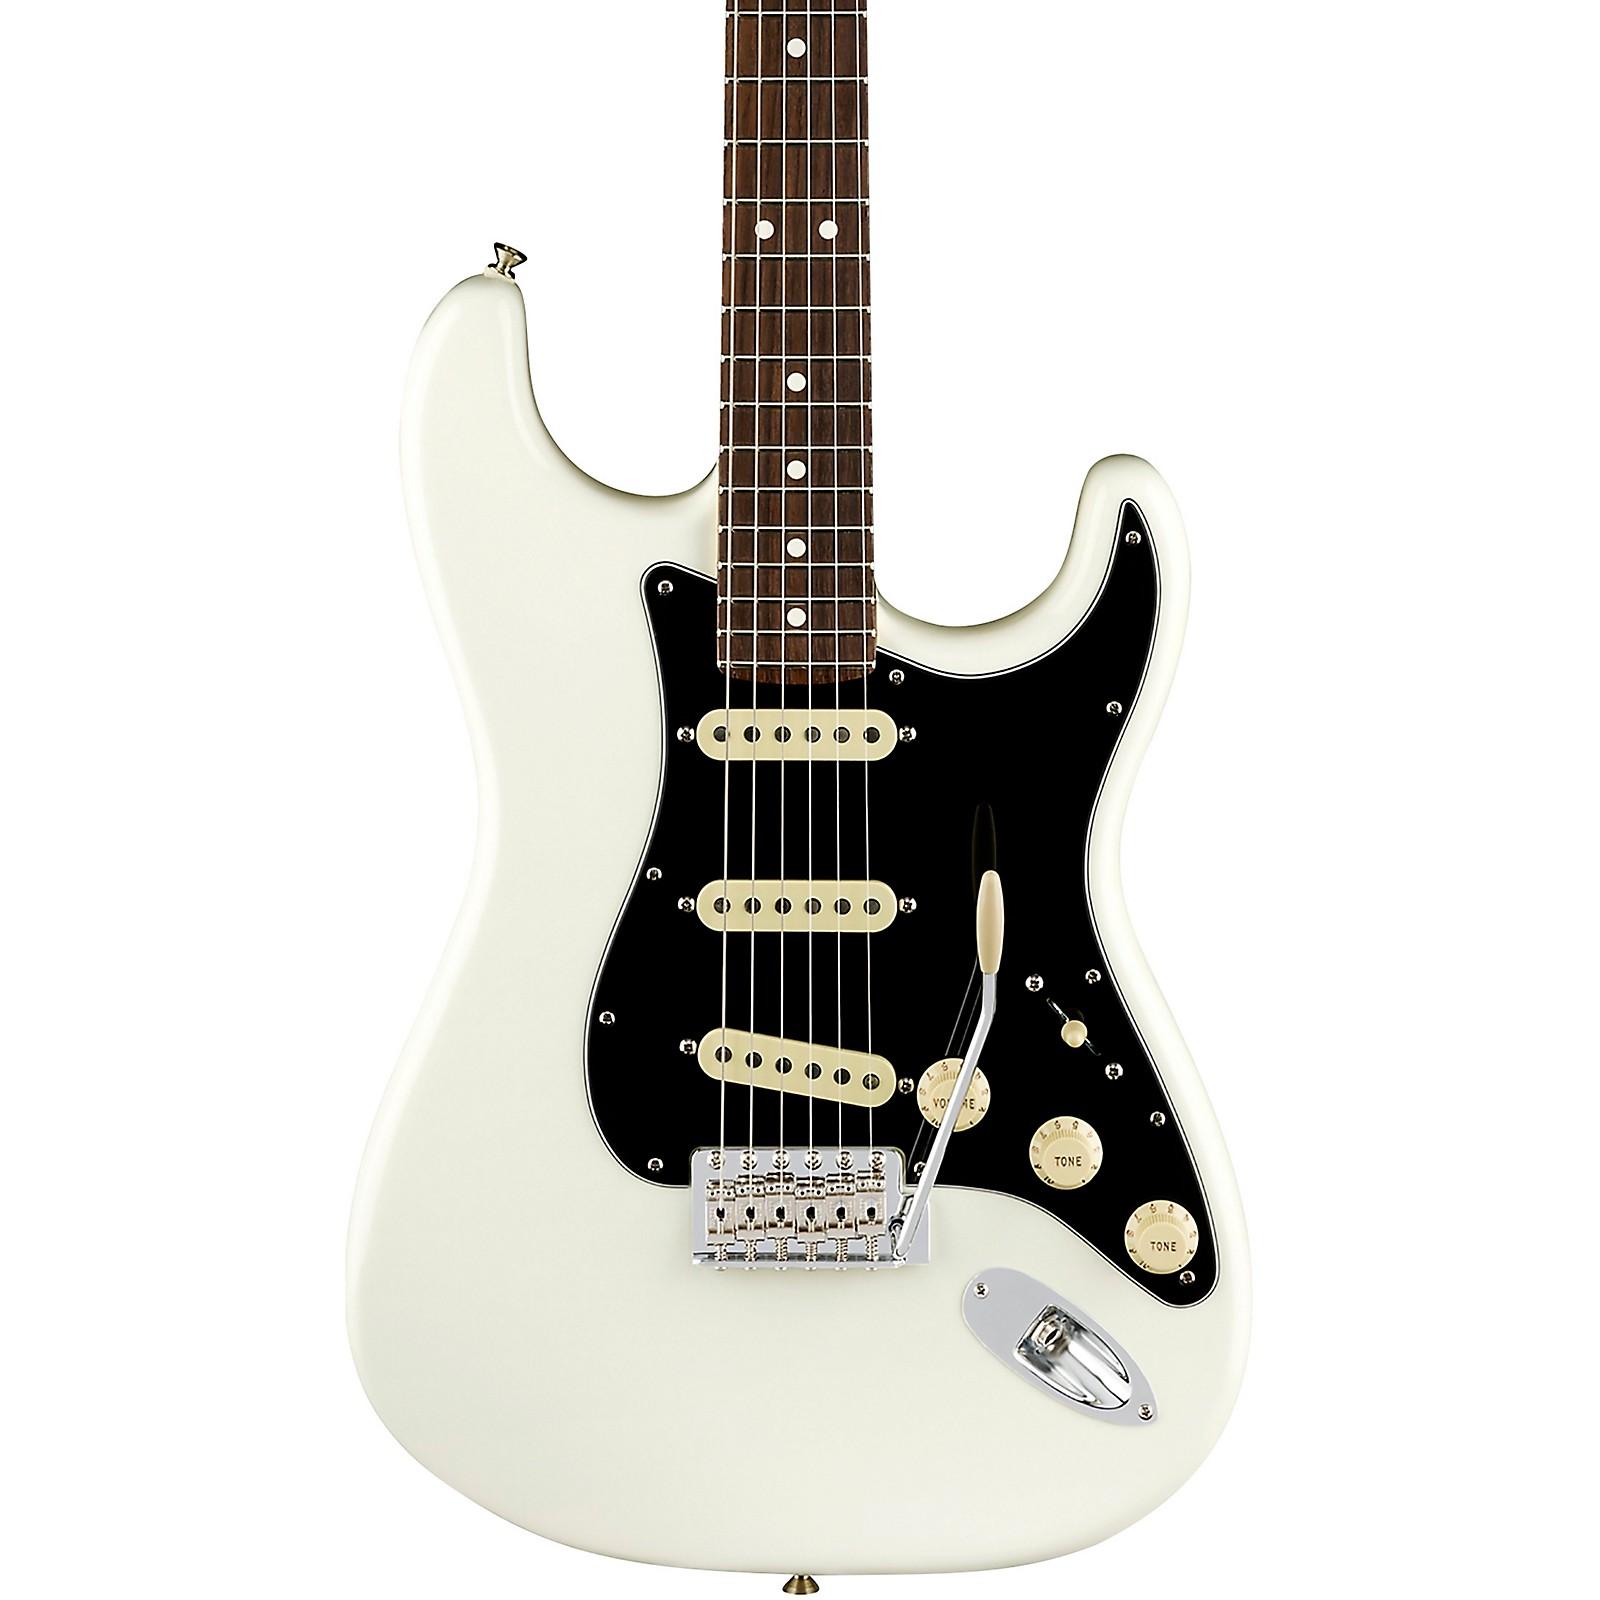 Fender American Performer Stratocaster Rosewood Fingerboard Electric Guitar